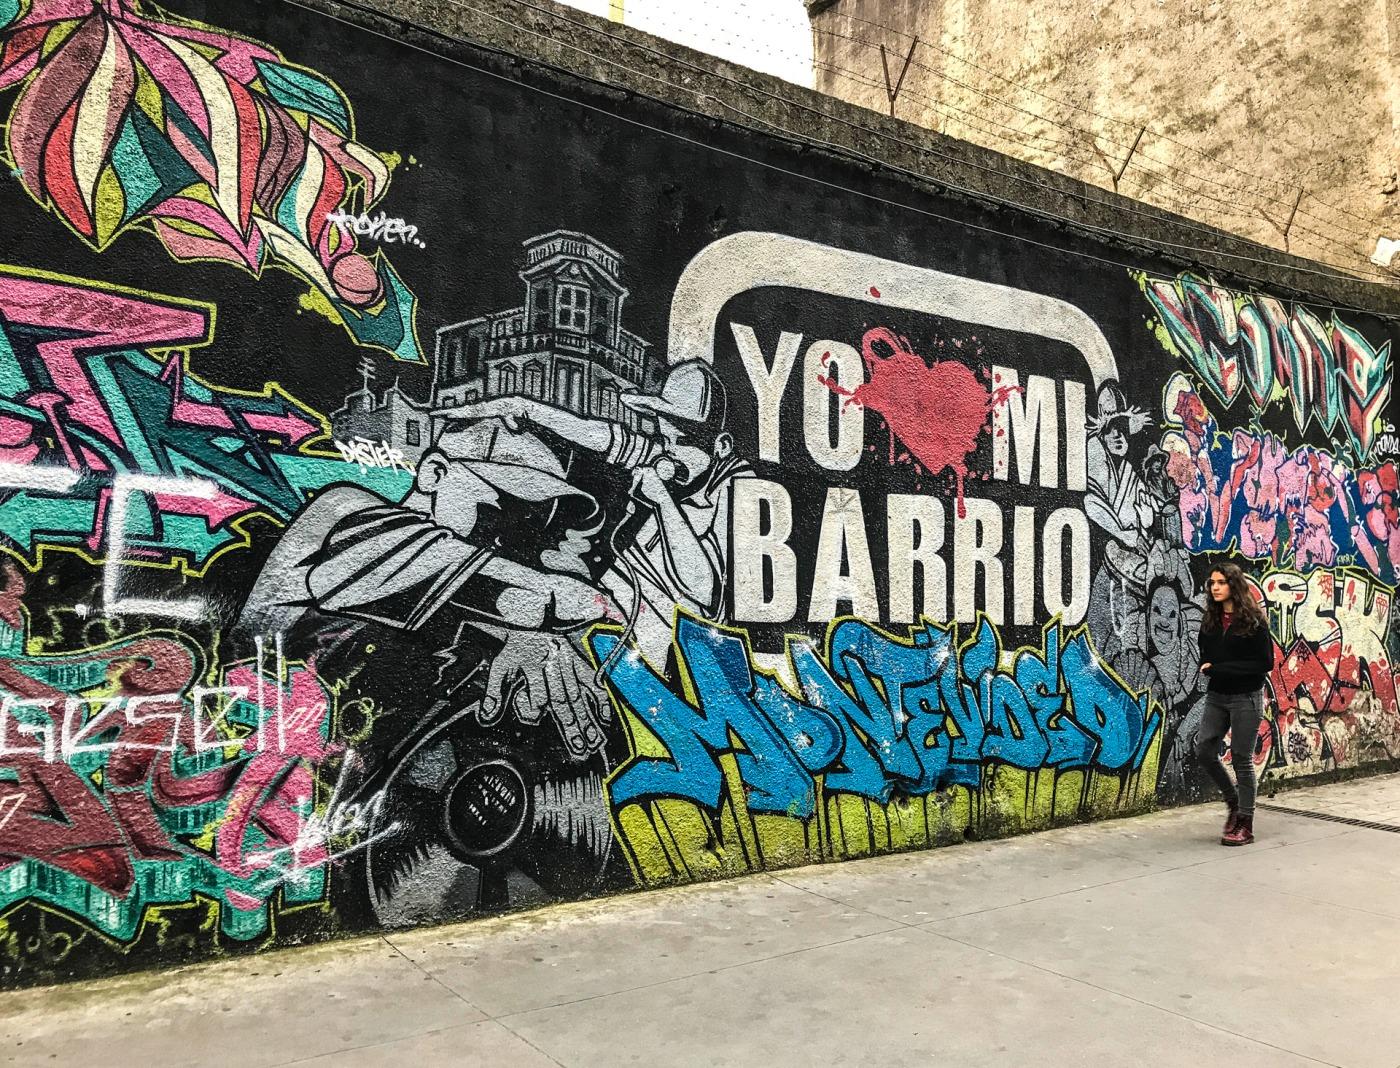 street art montevideo uruguay murale graff old school DISTER BR1 MOKEK CONDE PHER MIN8 copyright DESCONOCIDO - Le street art à Montevideo ? Un art de vivre !